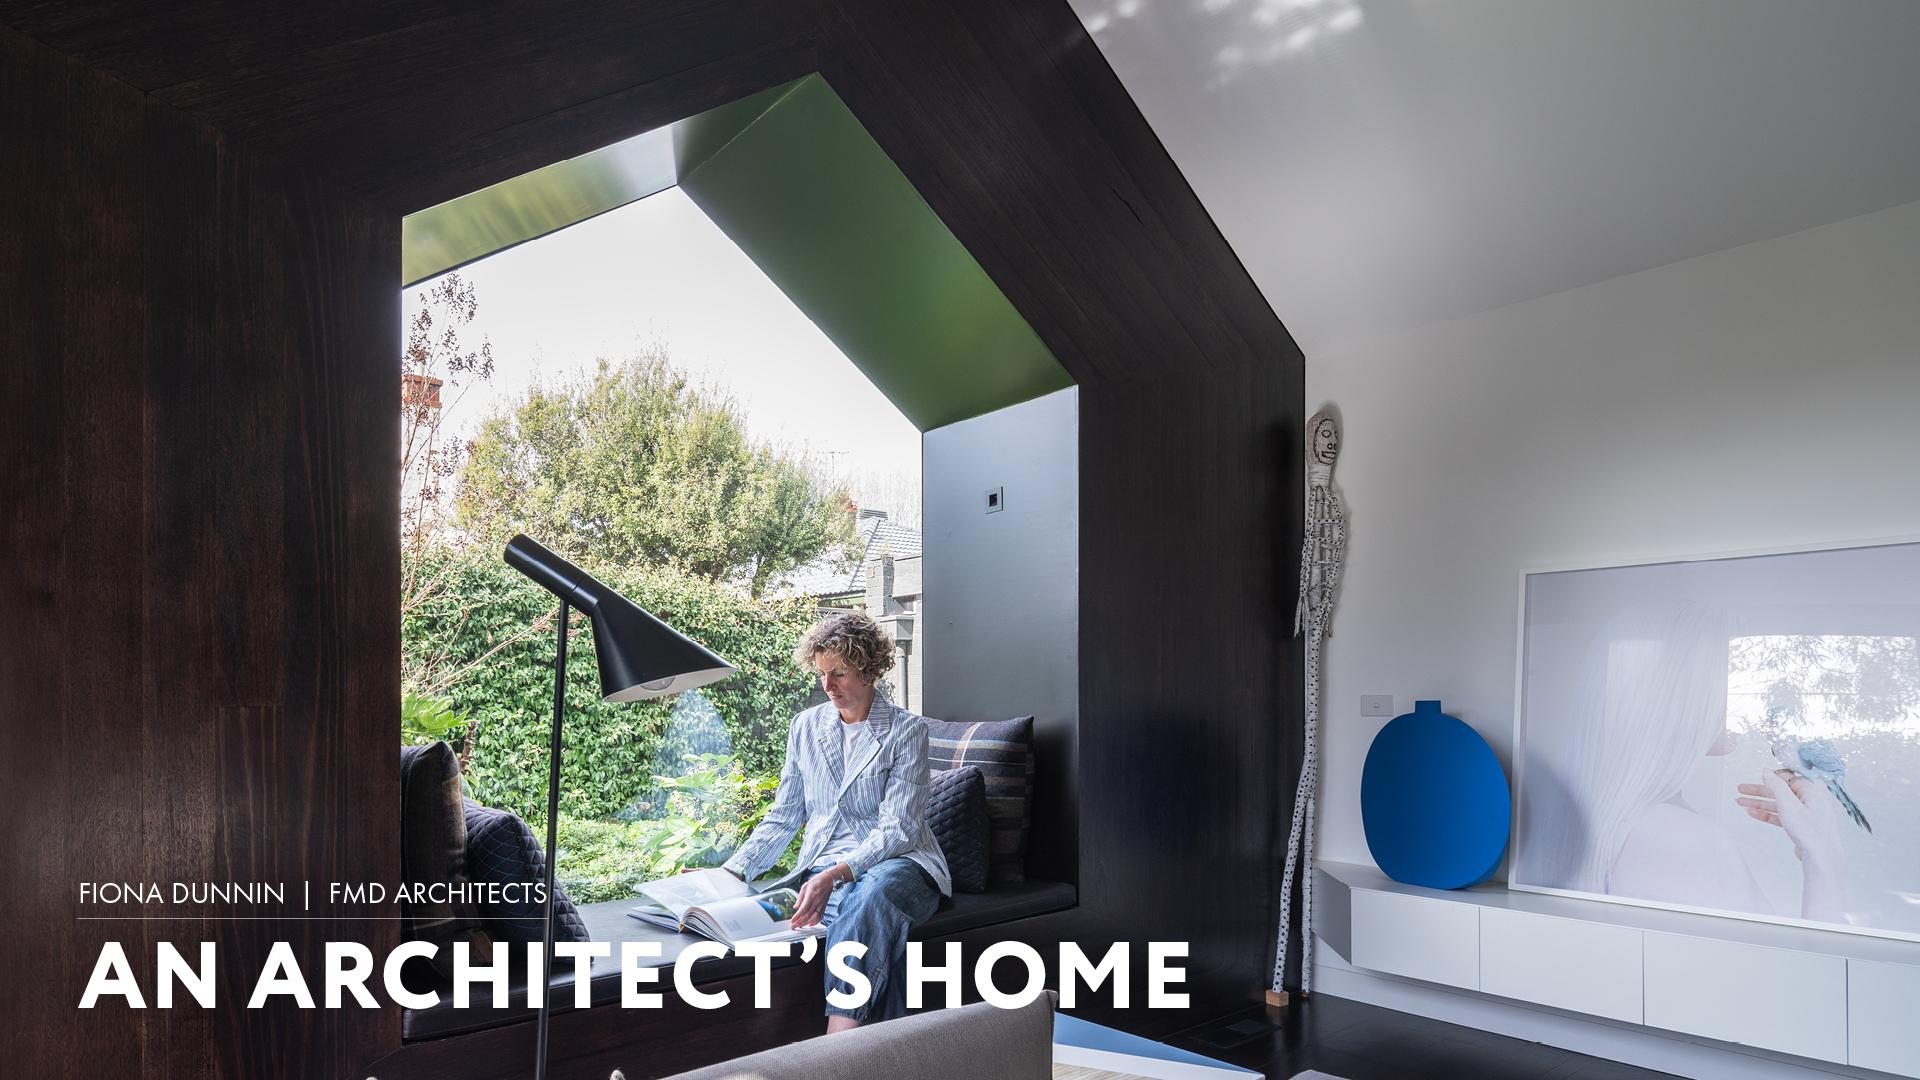 Architectural videographer